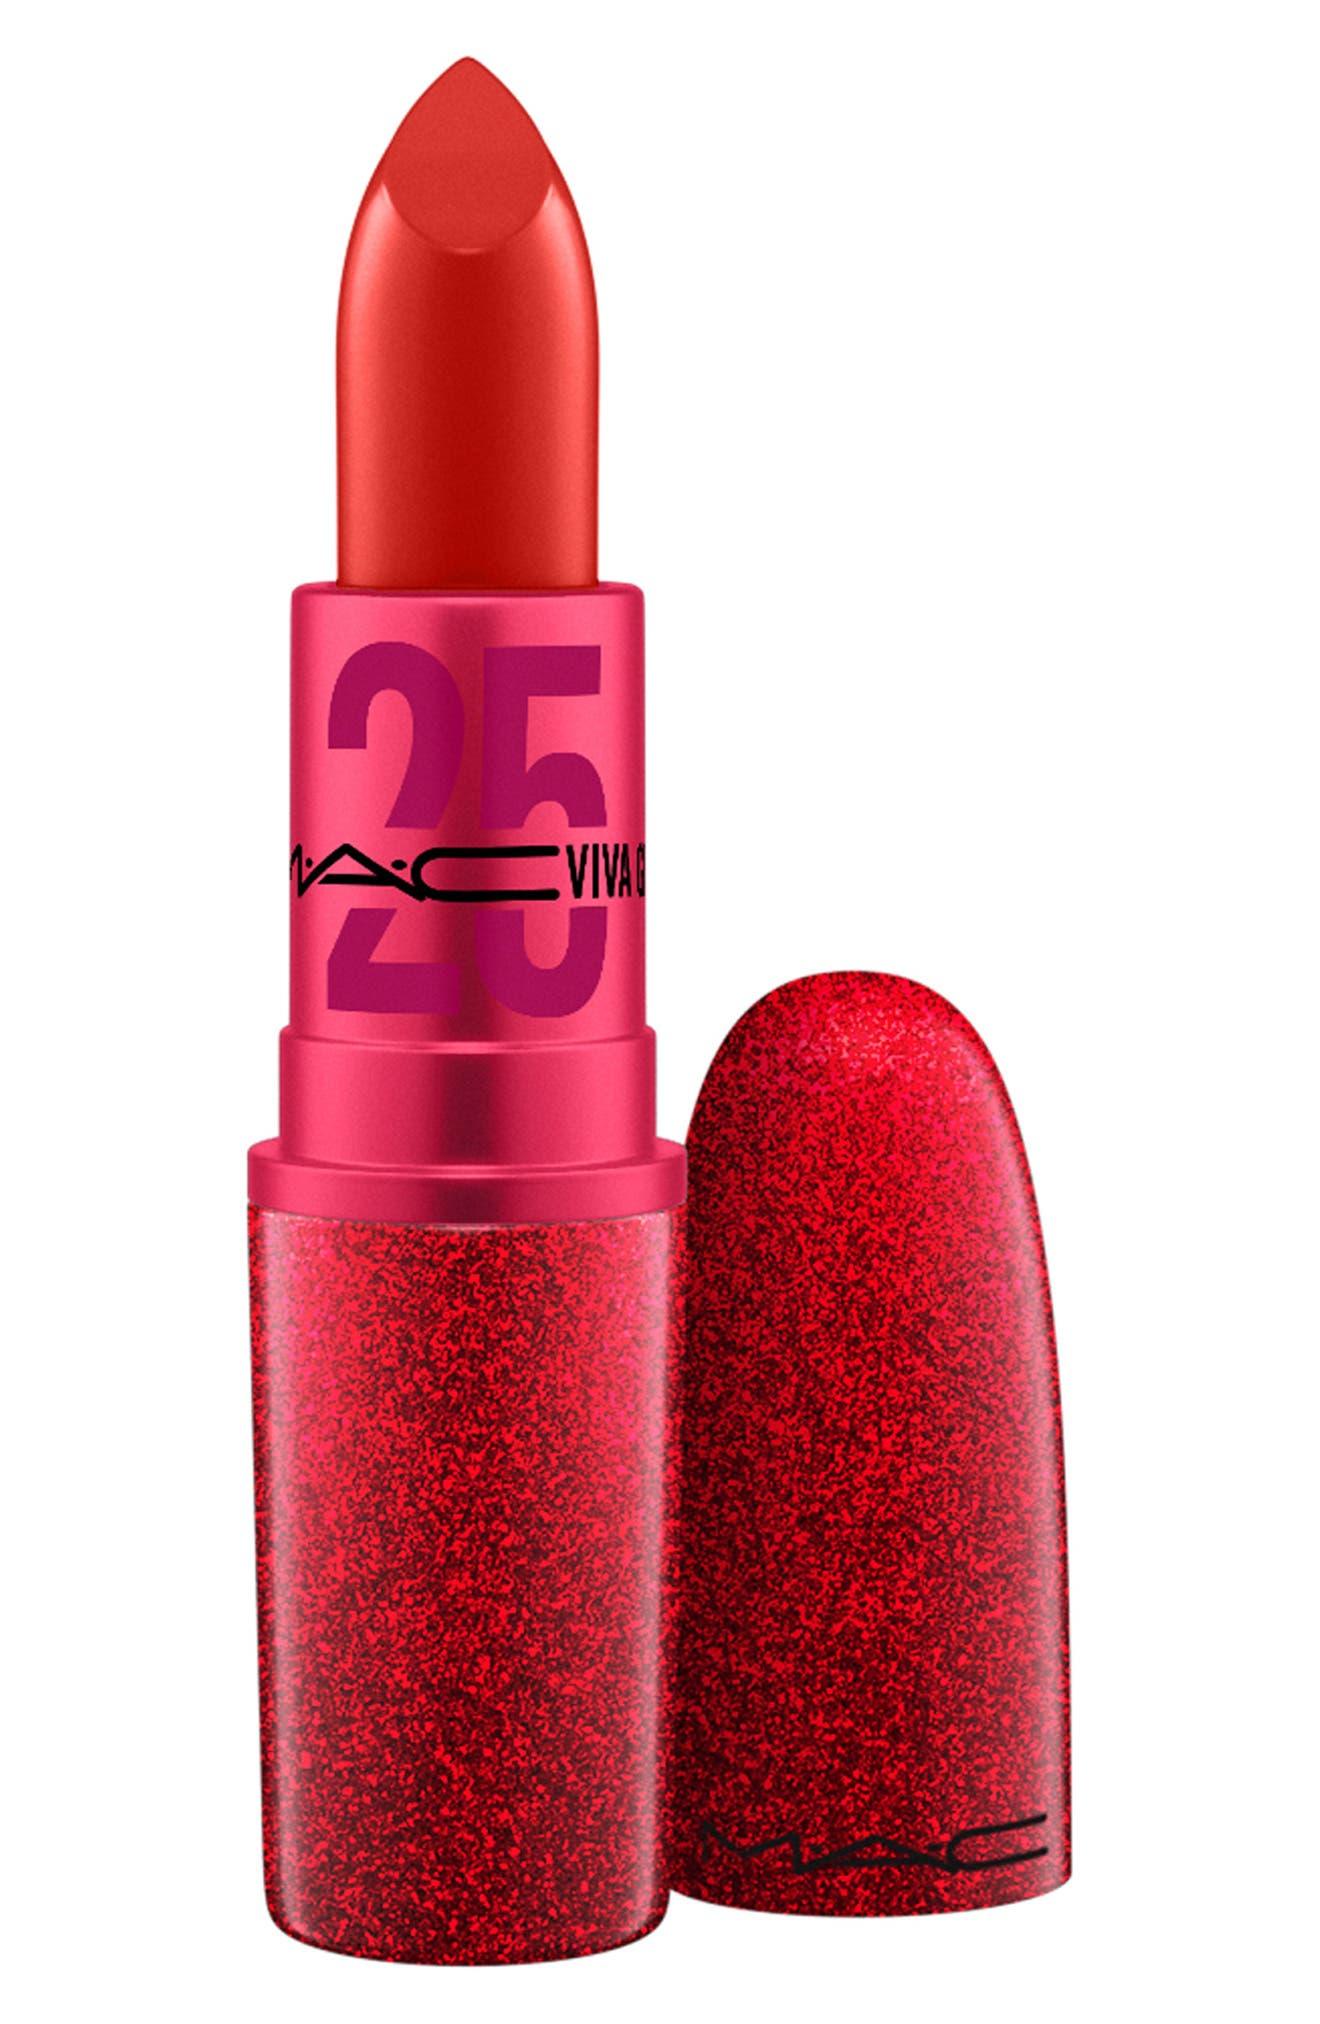 ,                             MAC Viva Glam 25 Lipstick,                             Main thumbnail 1, color,                             NO COLOR